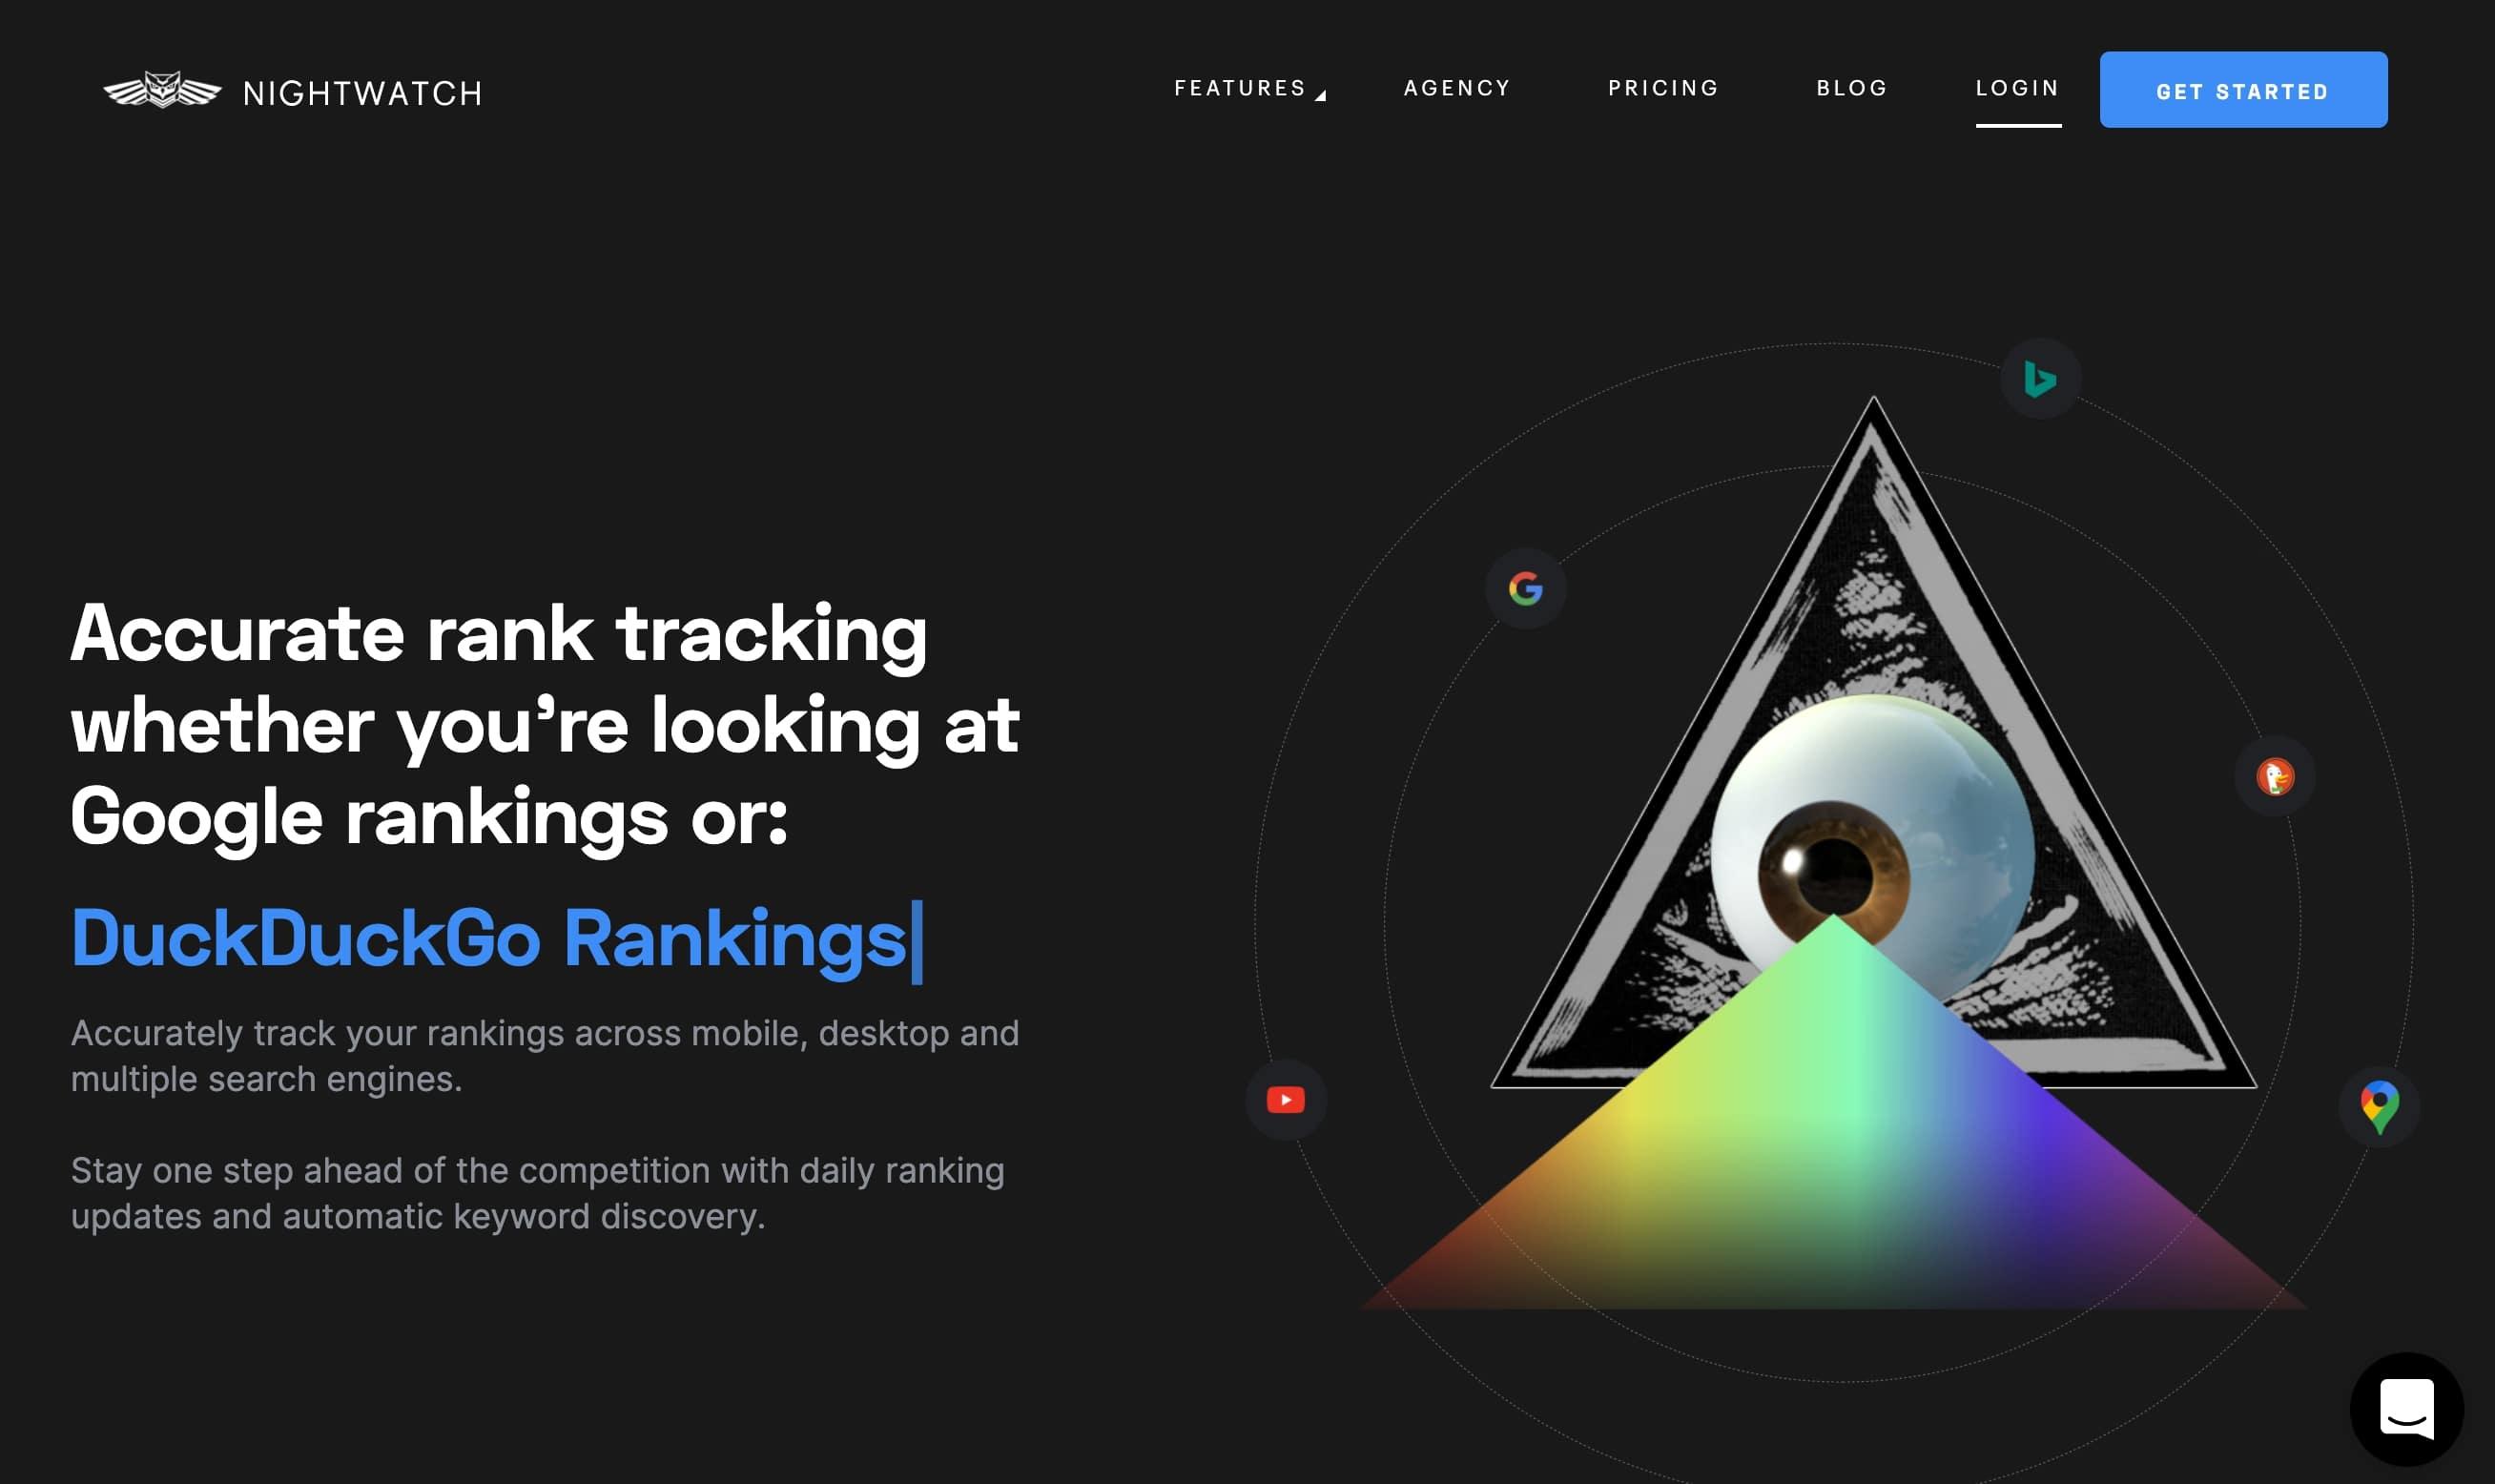 nightwatch rank tracker landing page